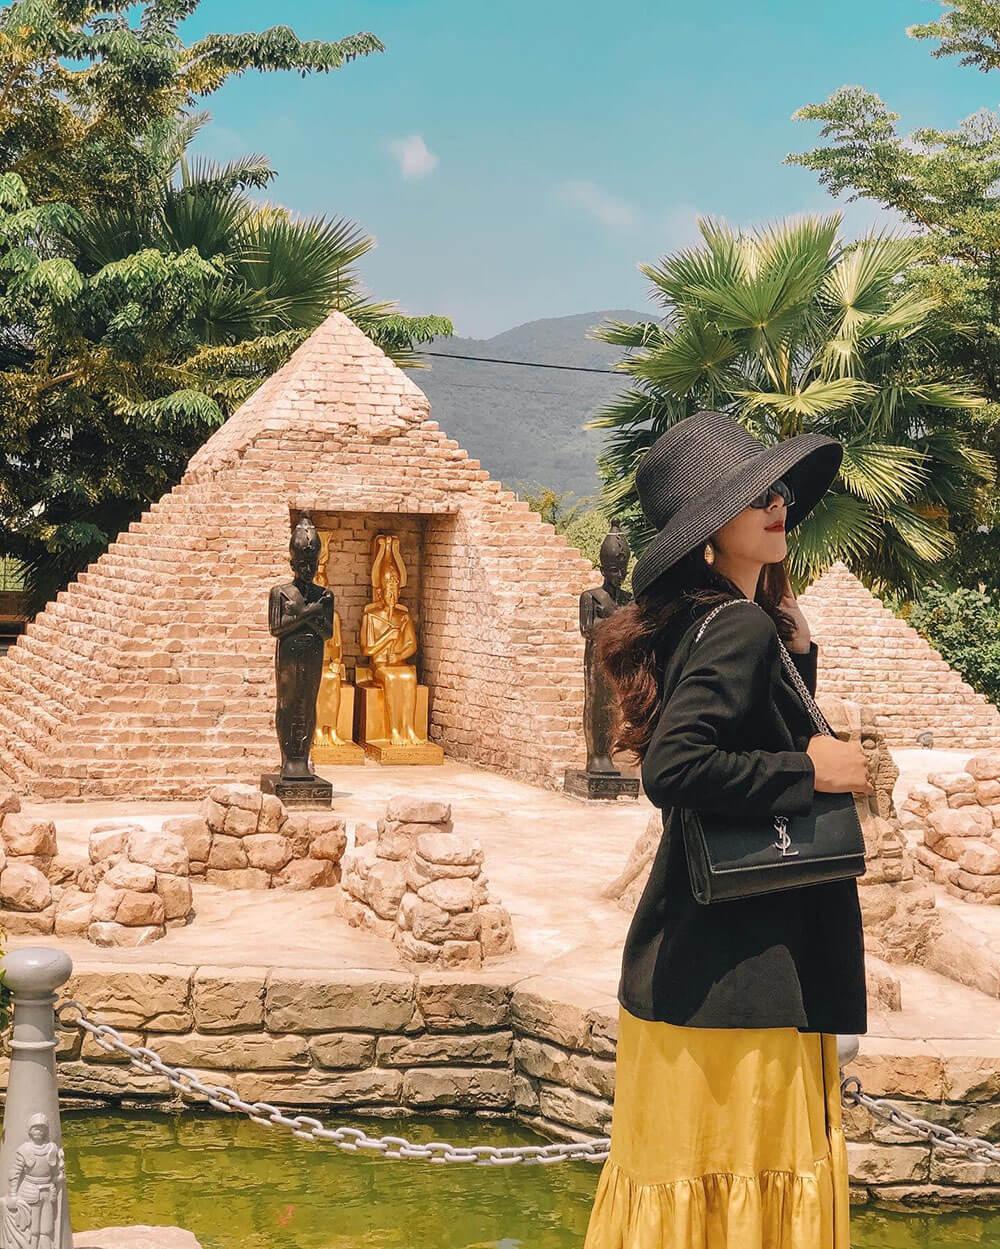 Cong Vien Ky Quan The Gioi Khach San Danang Golden Bay Review Hue Da Nang Hoi An Ninh Binh 7n7d Chi Voi 8 Trieu Tin Duoc Khong 03